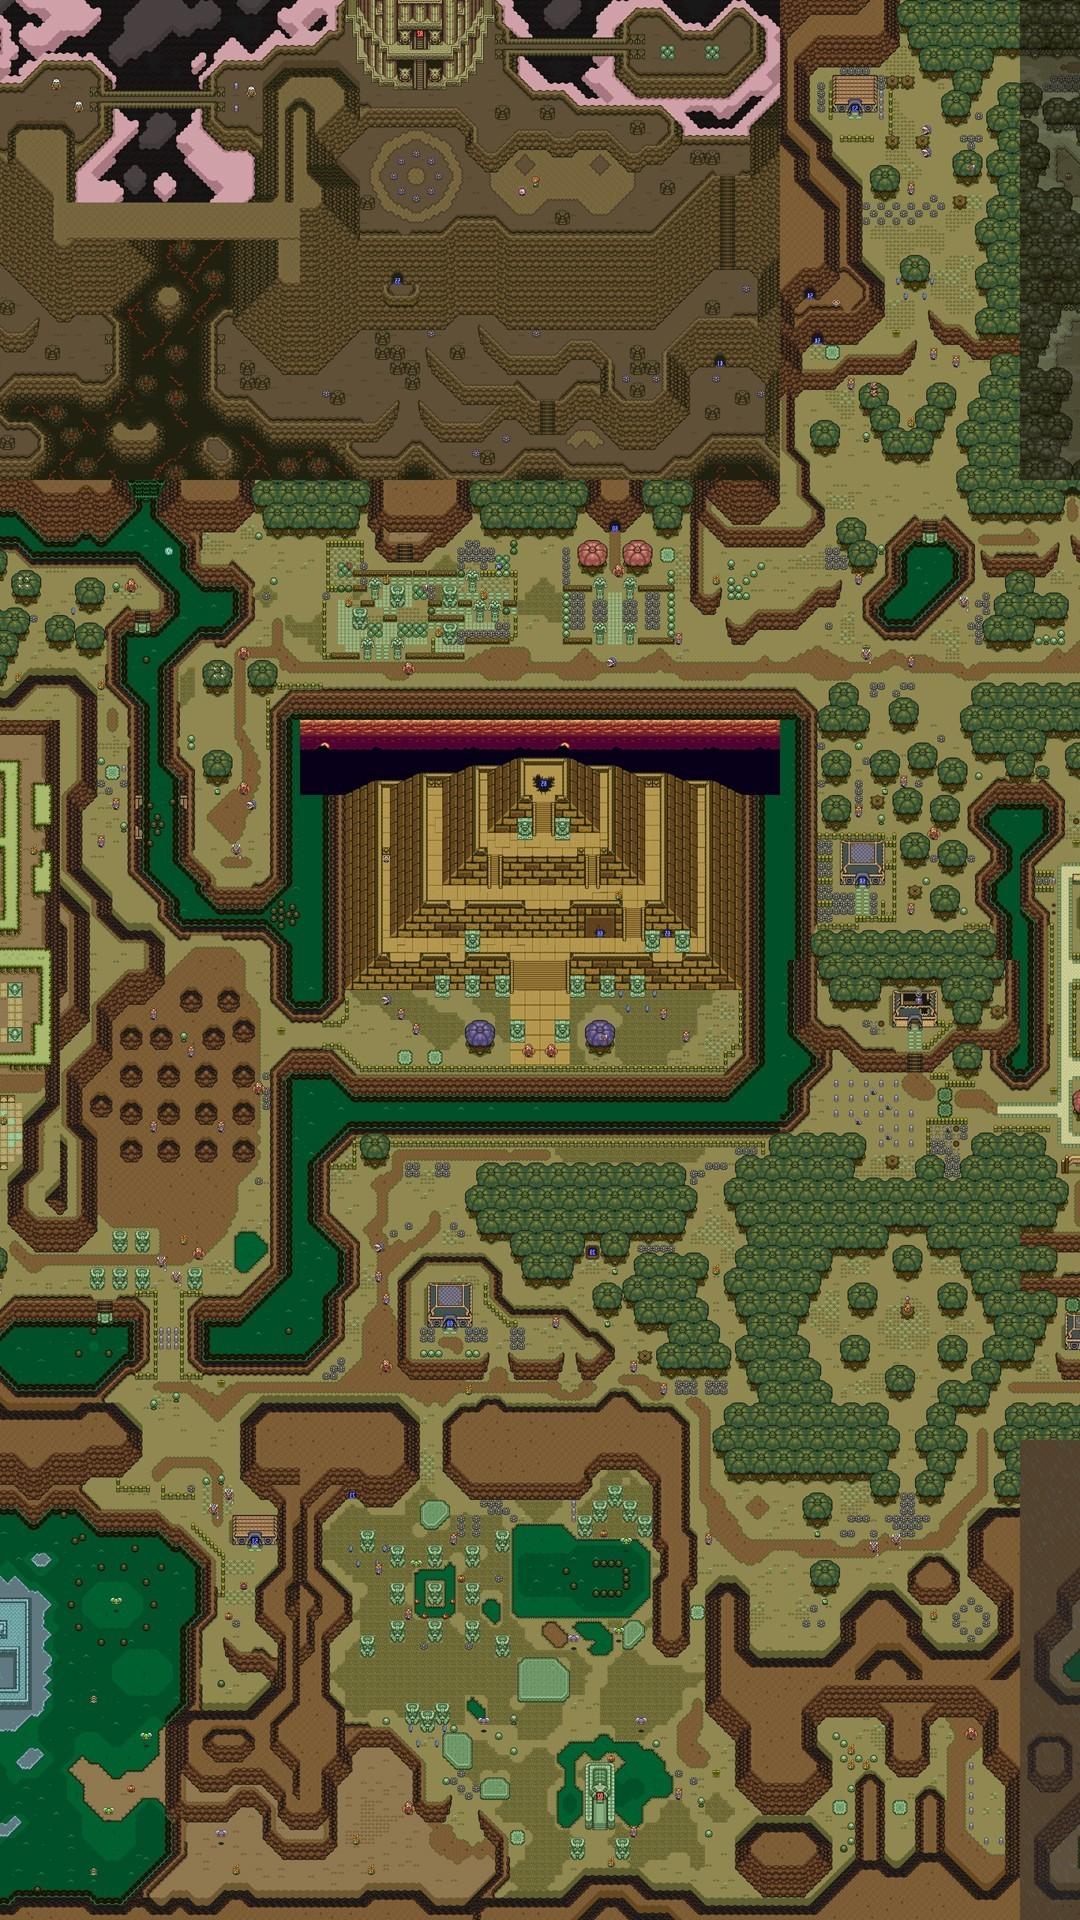 Legend of zelda iphone wallpaper 74 images 1080x1920 wallpaper zelda iphone background free download pic publicscrutiny Choice Image